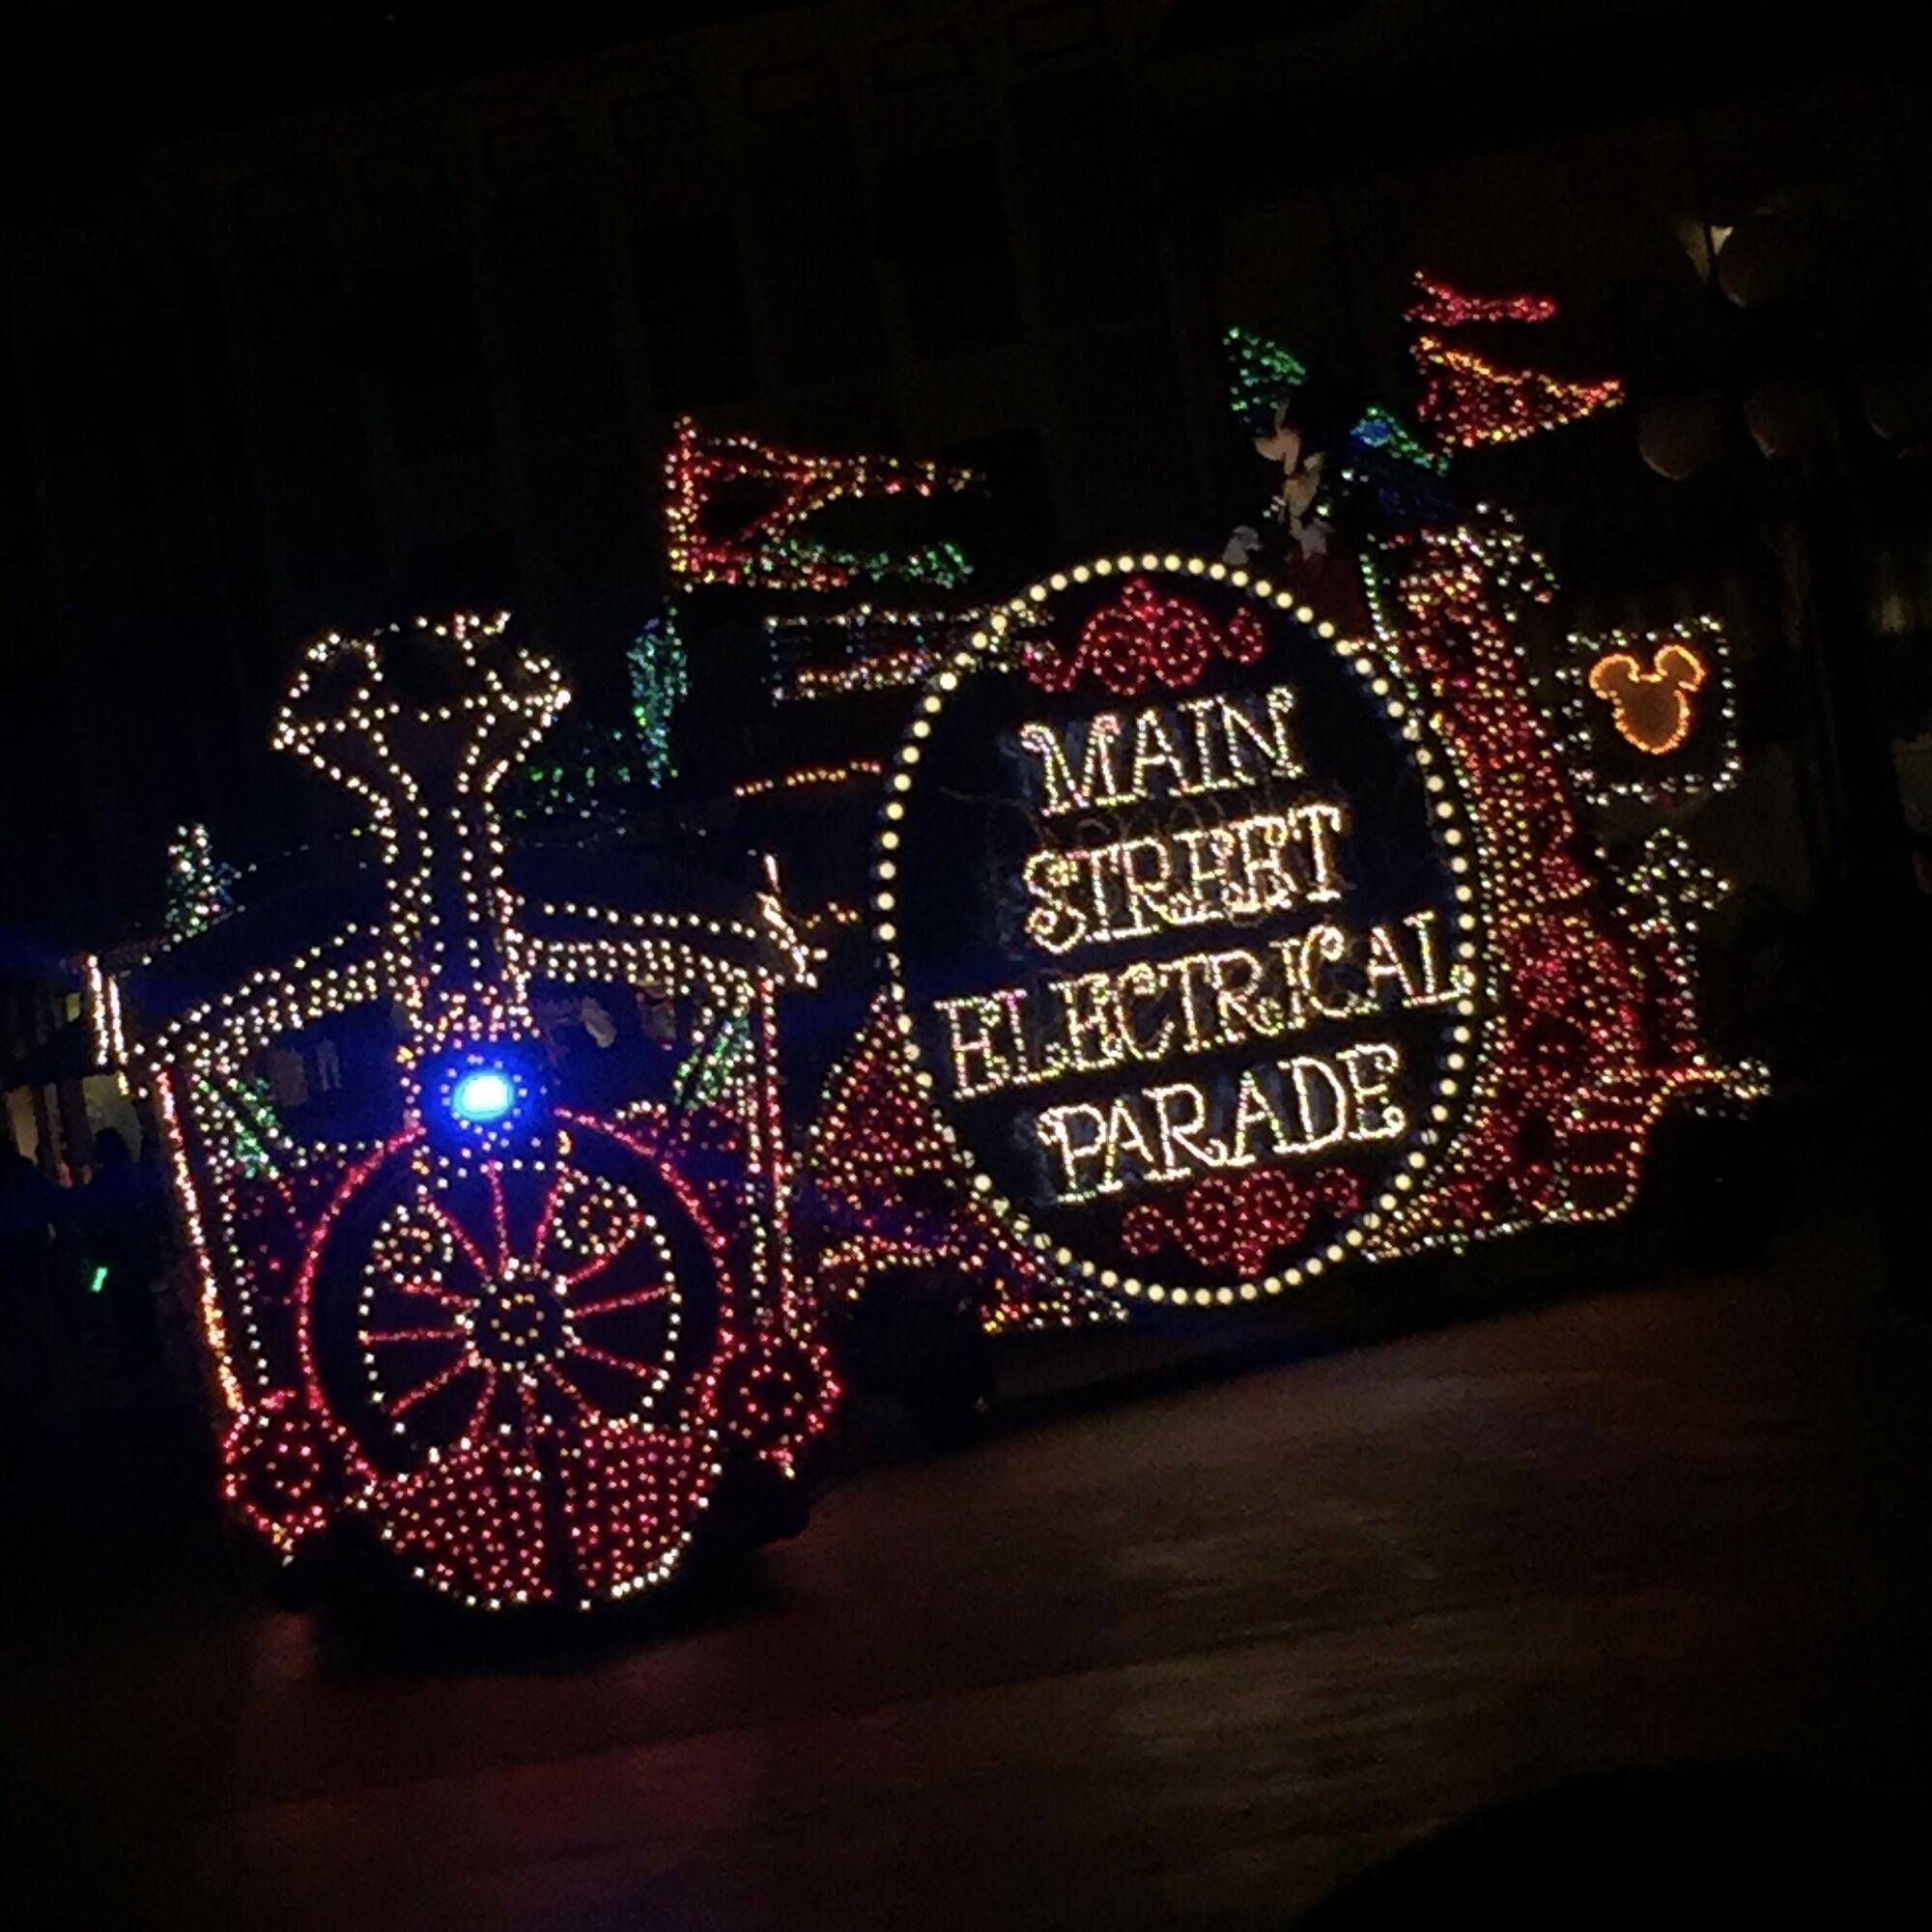 Main Street Electrical Parade | Disney Wiki | FANDOM powered